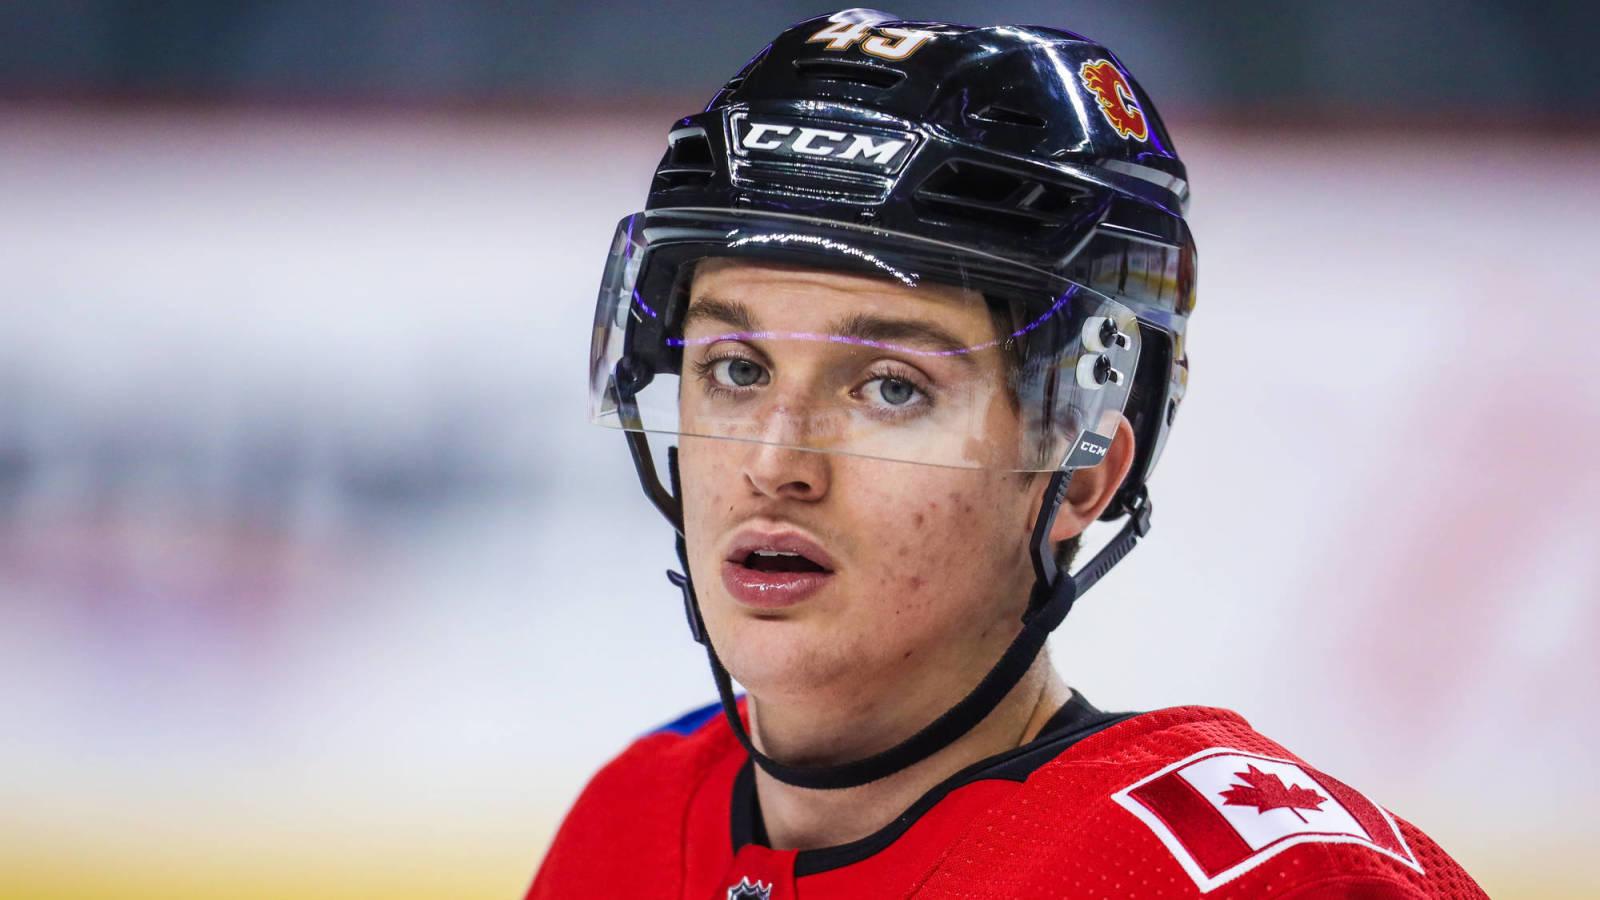 Flames prospect Jakob Pelletier has been dealt to Val-d'Or